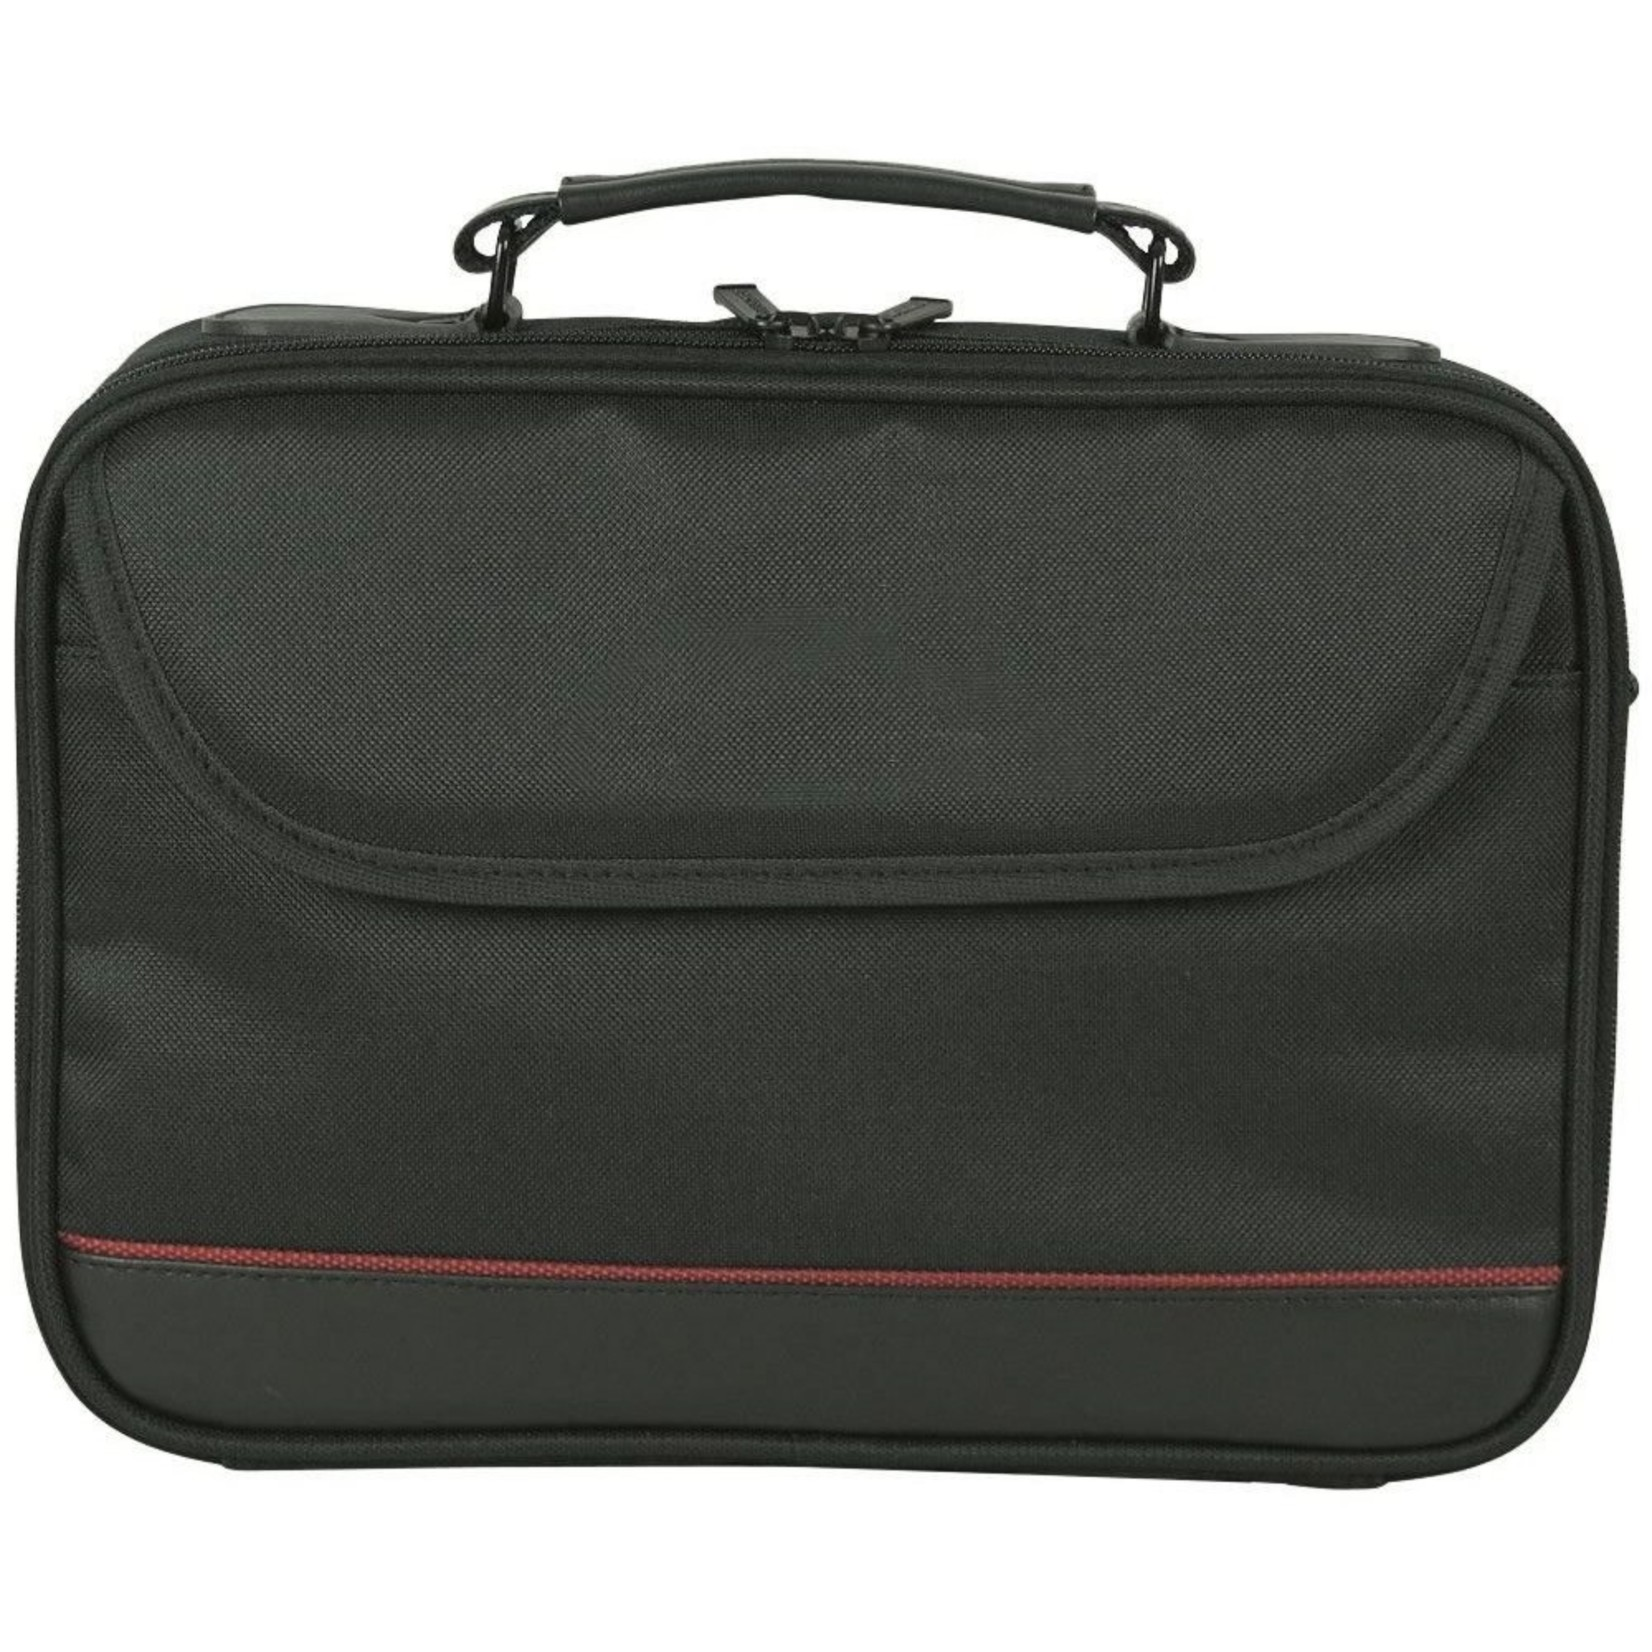 OEM Platinet Notebook Bag 16inch